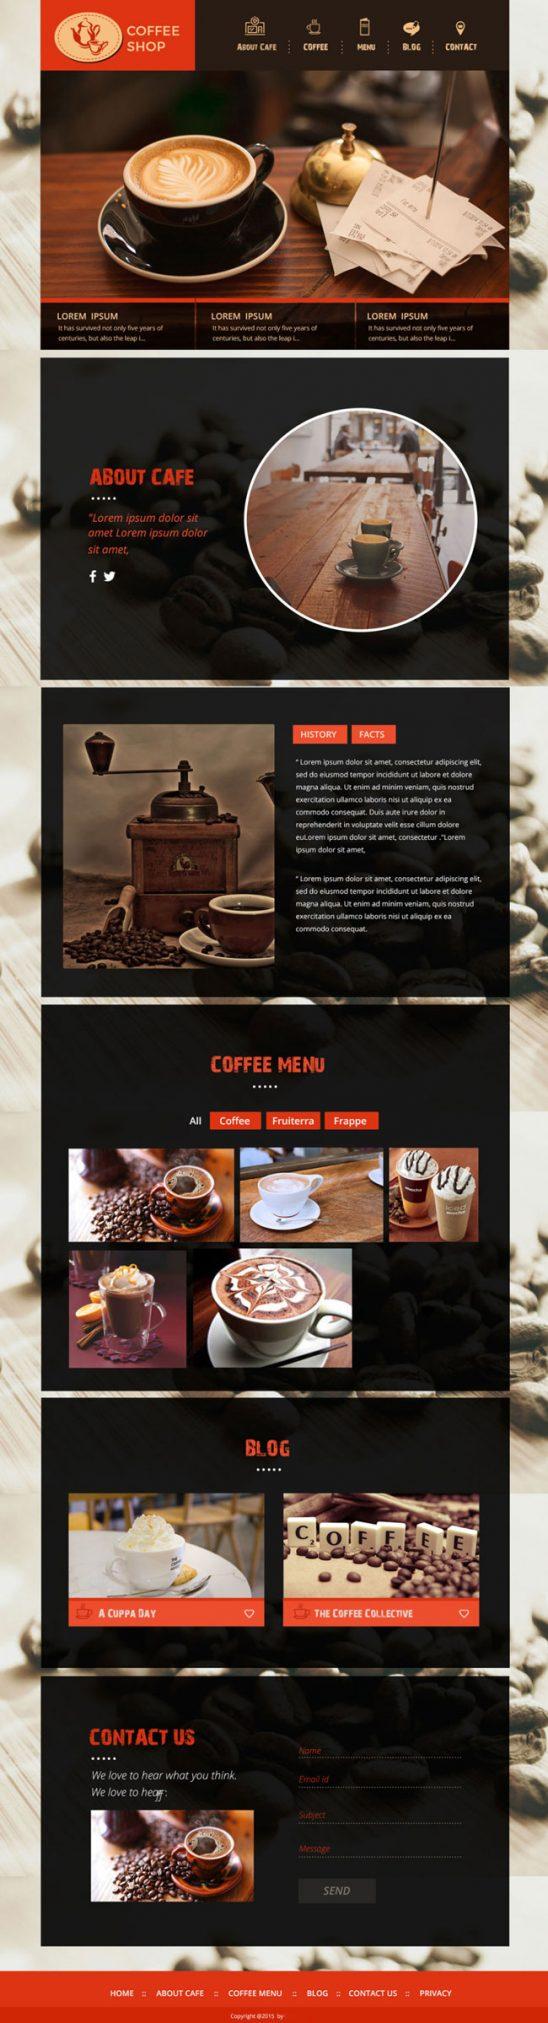 p511 548x2023 - قالب آماده سایت قهوه و کافی نسکافه ویژه کافی شاپ ها و قهوه خانه ها